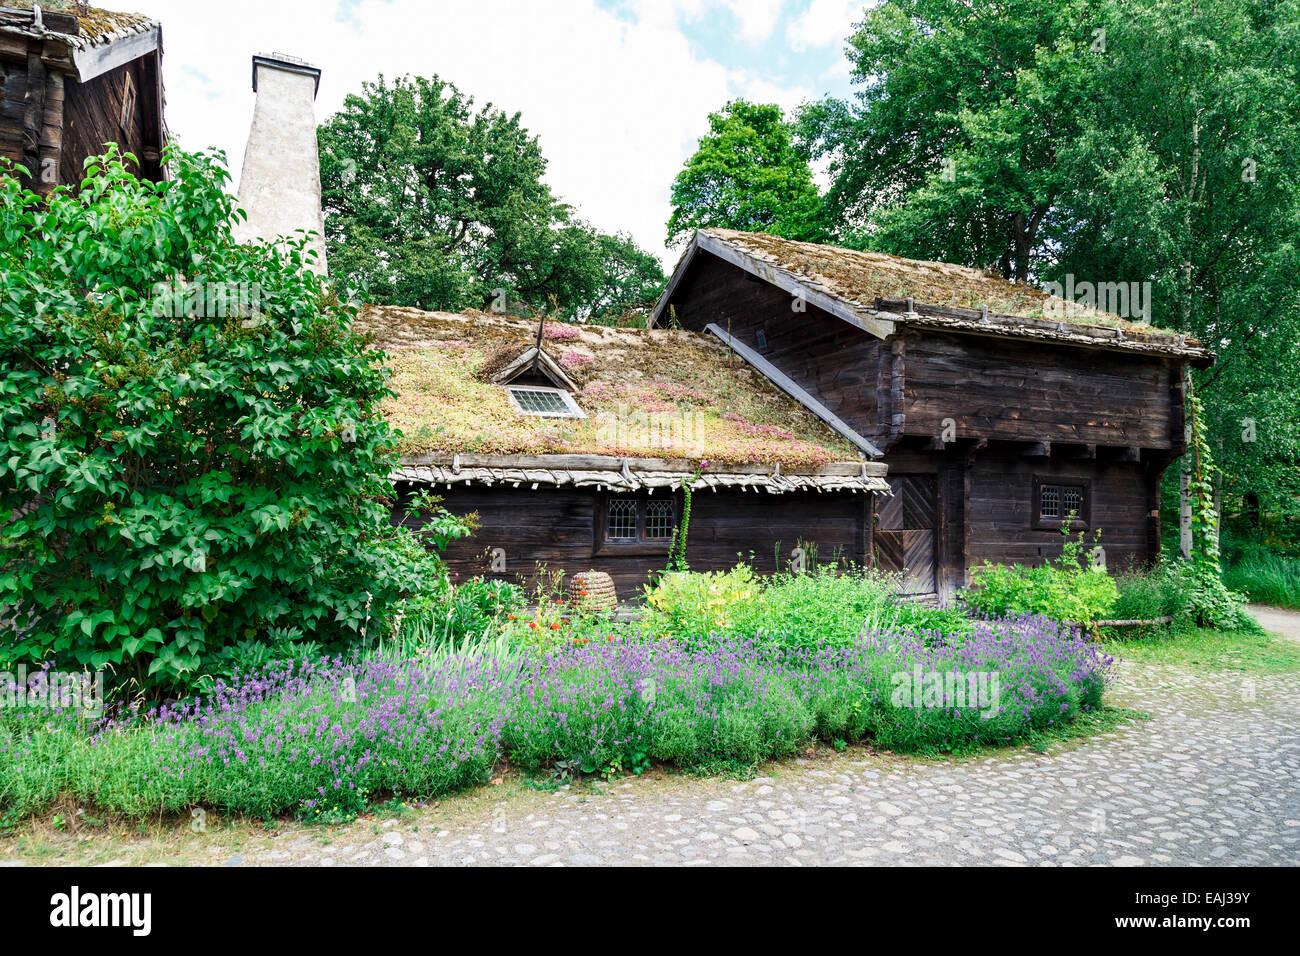 Traditional swedish farmhouse with flowering garden at Skansen, Stockholm, Sweden - Stock Image